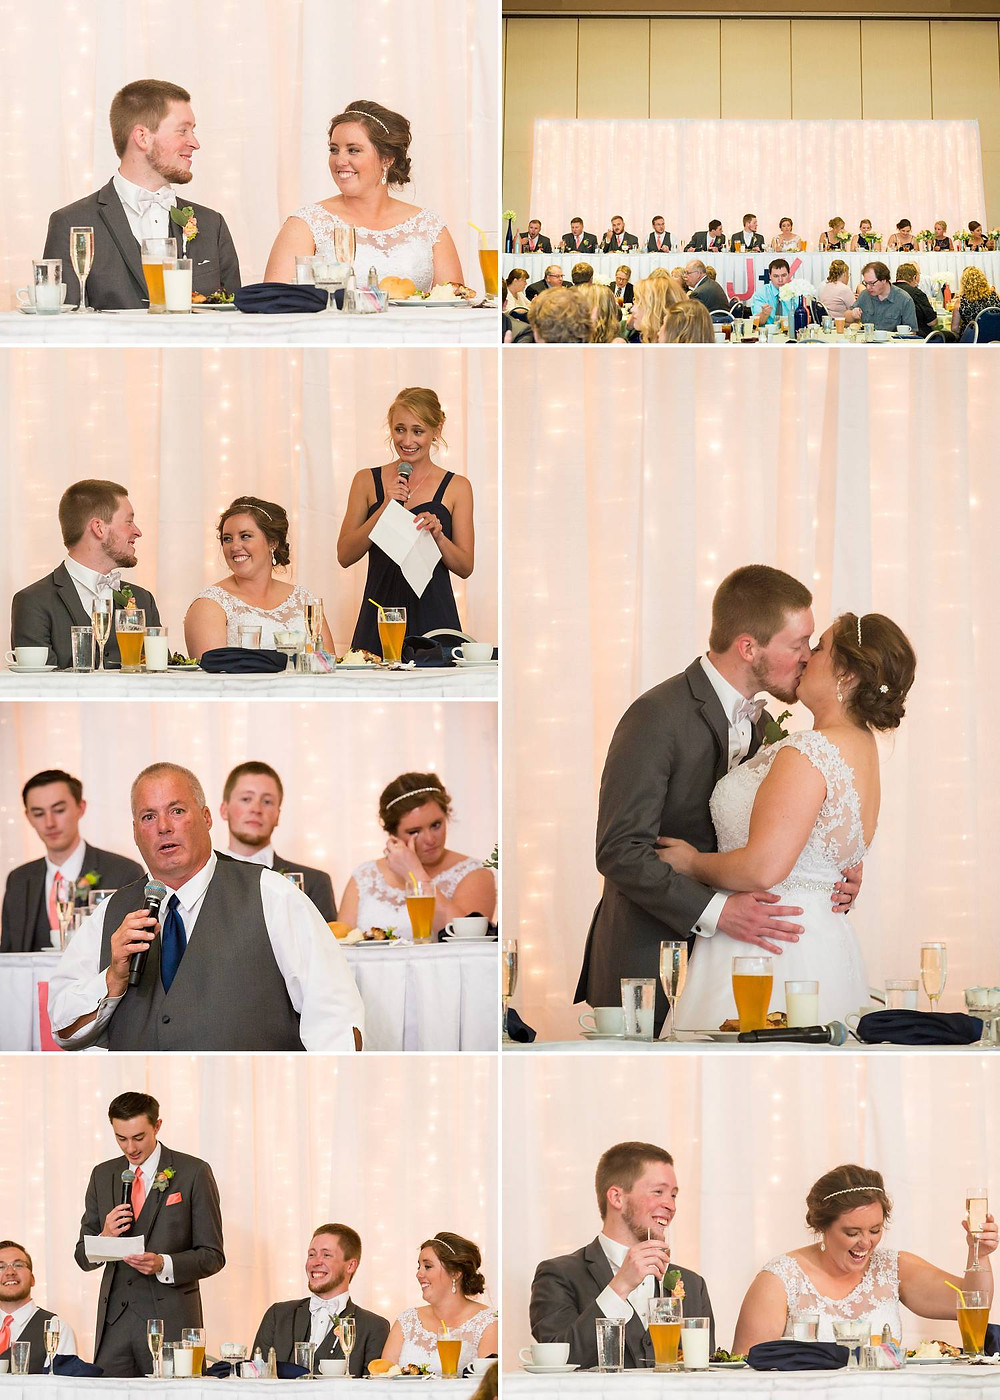 Oshkosh Convention Center Wedding Dinner | Lanari Photography